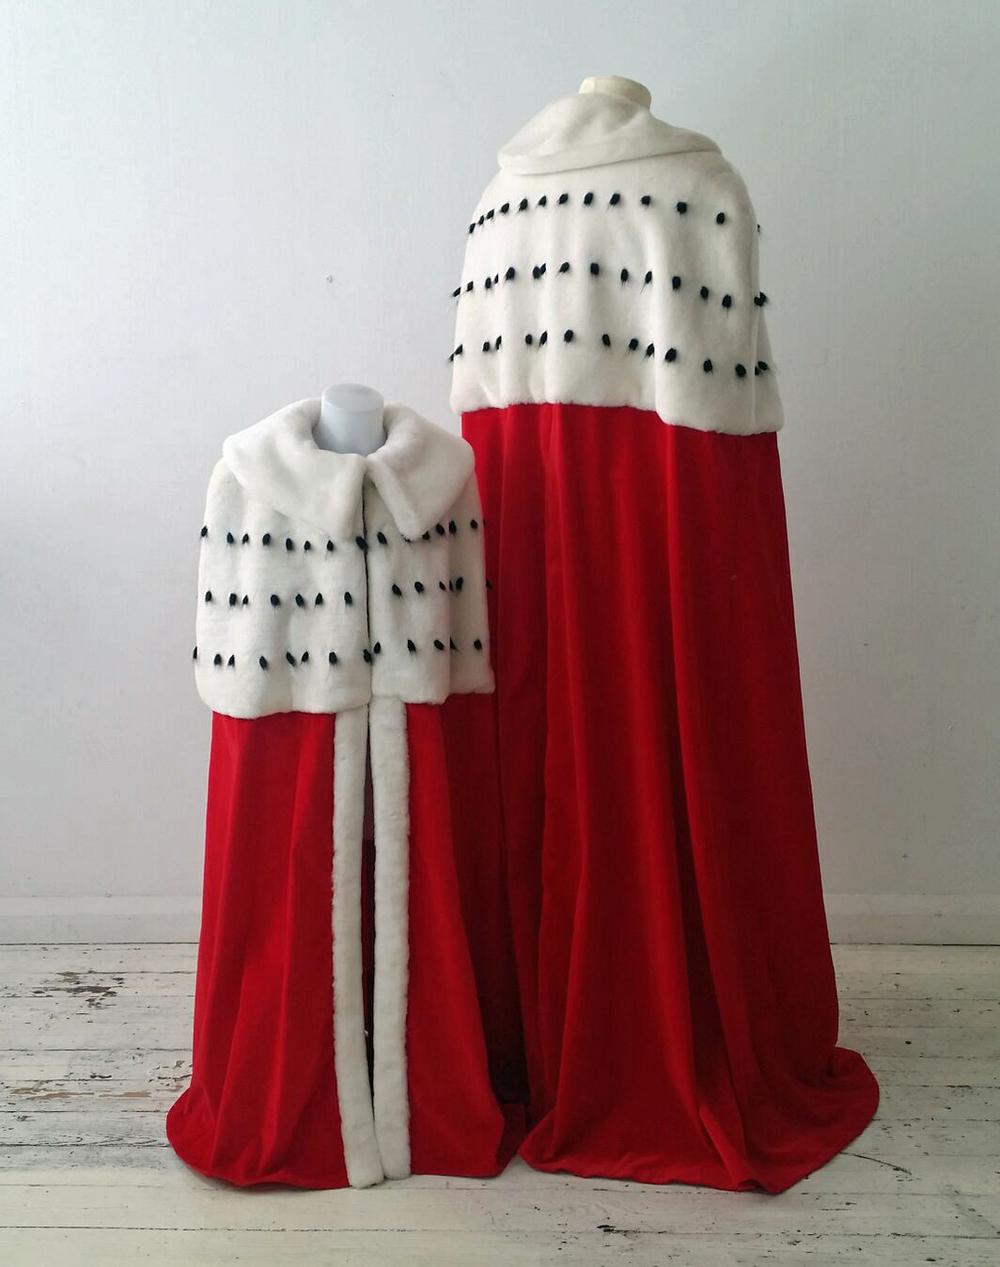 Lord Manfield's Cloak